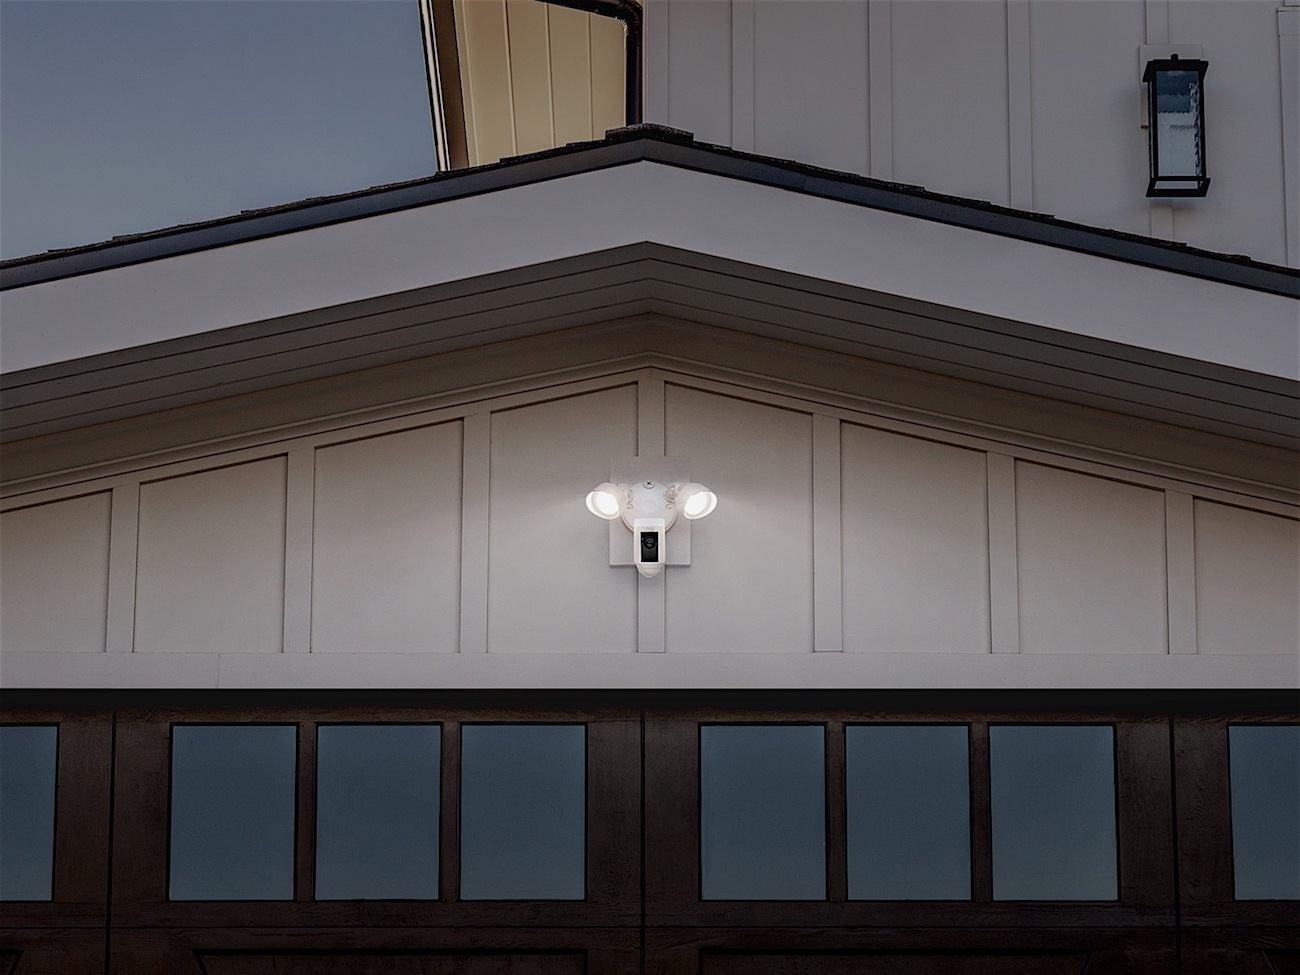 Ring Security Floodlight Camera 187 Gadget Flow